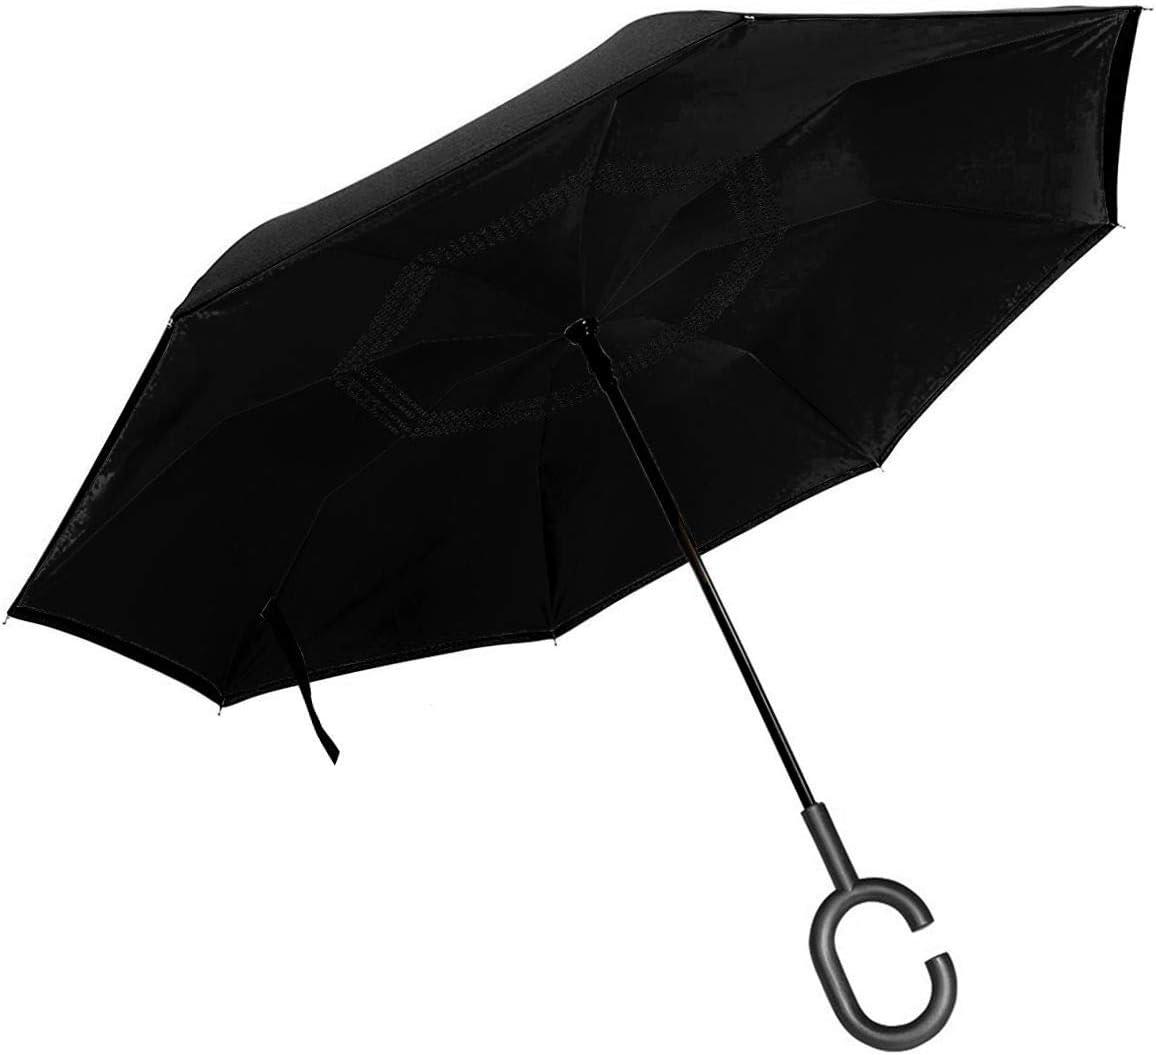 Simple Pattern Windproof Double Layer C-Shaped Handle Car Reverse Umbrella UV Protection /& Rain Unique Umbrella